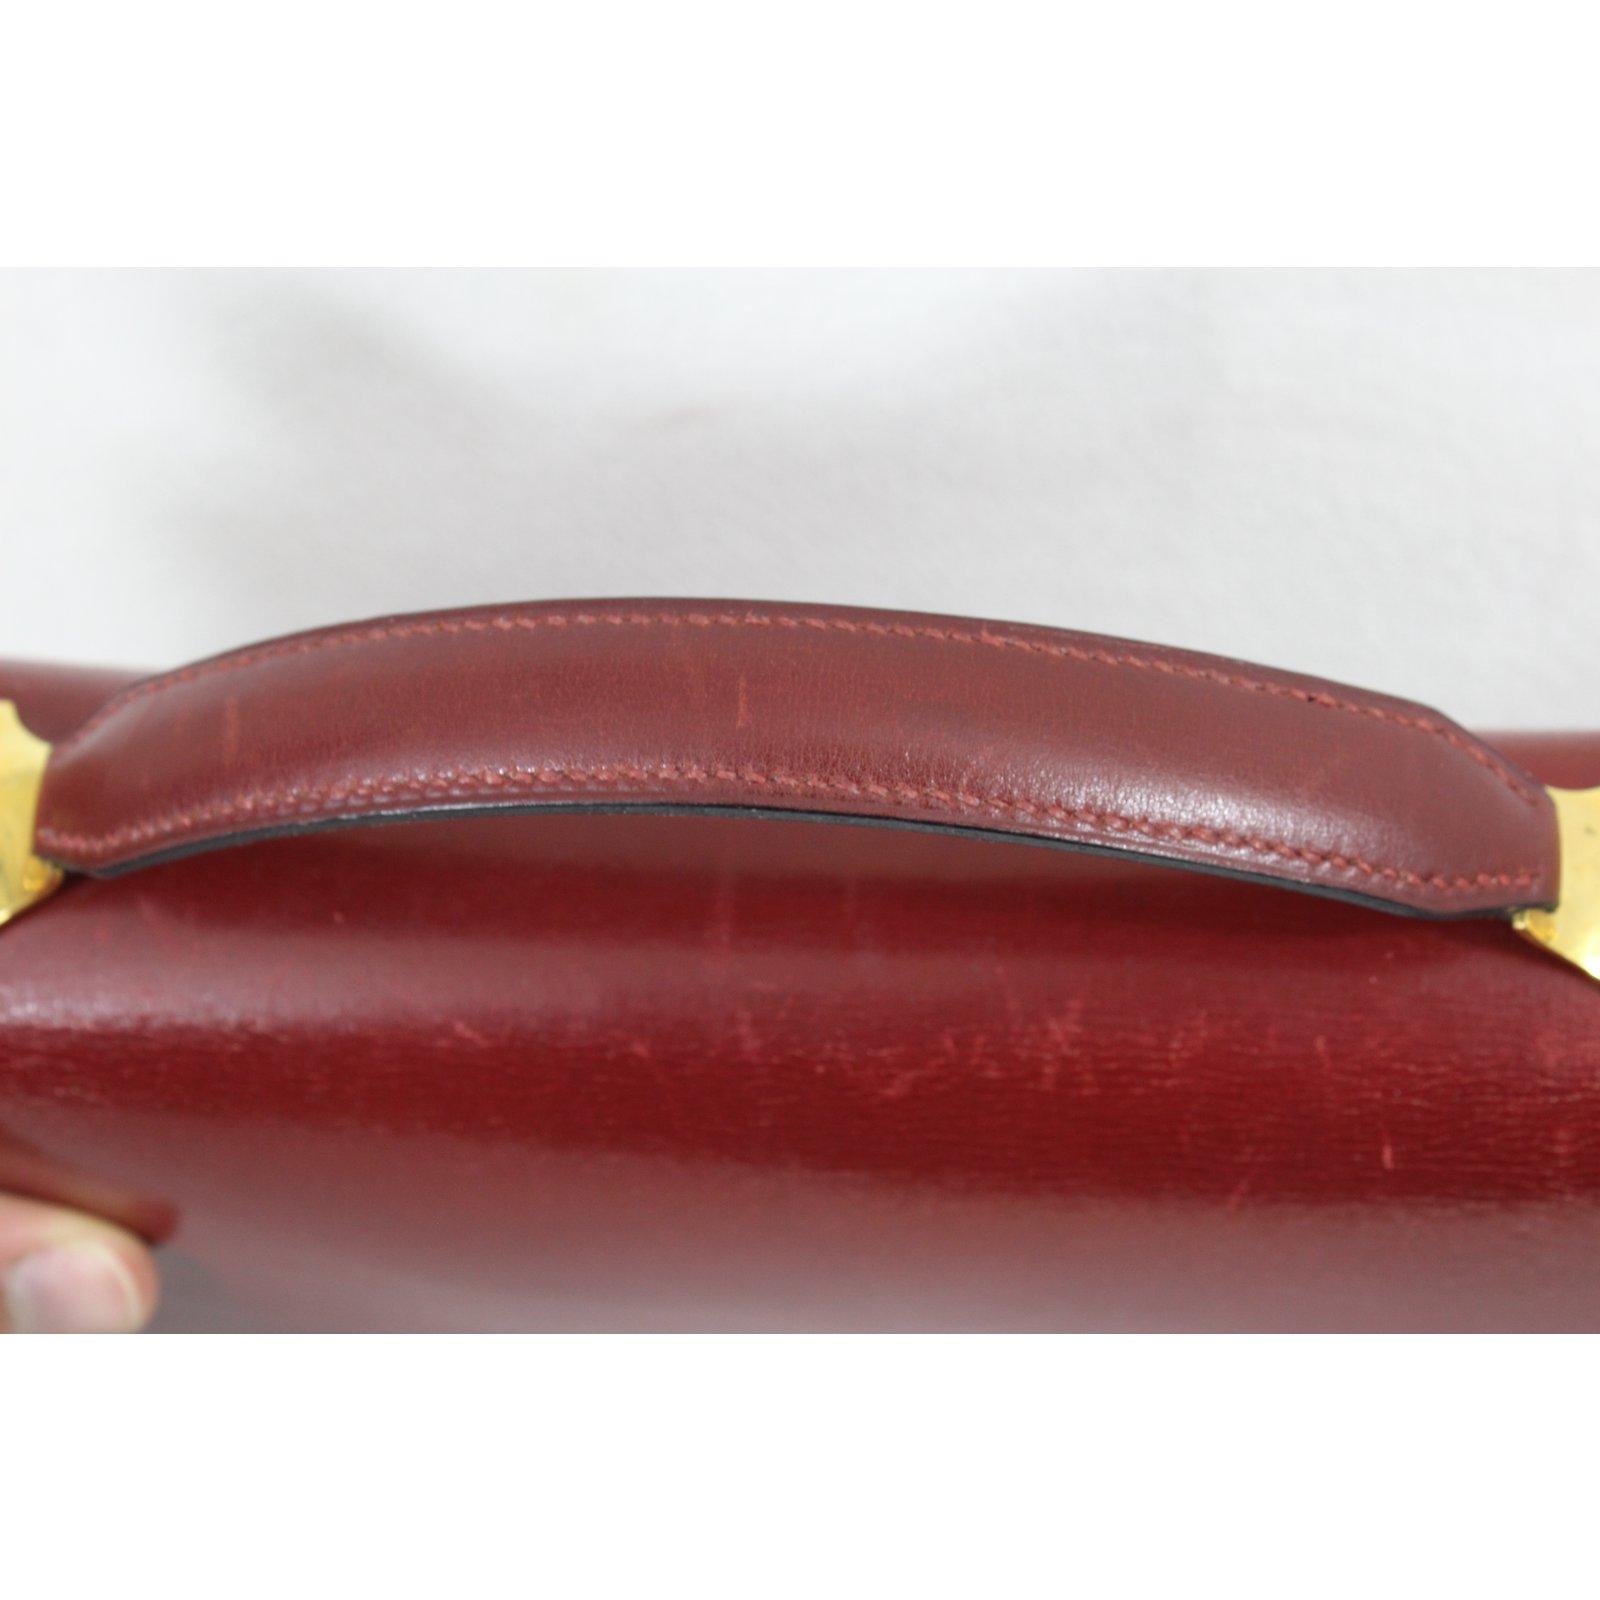 31262d29de70 Facebook · Pin This. Hermès Vintage Clutch Handbags Leather Dark red ref .49060